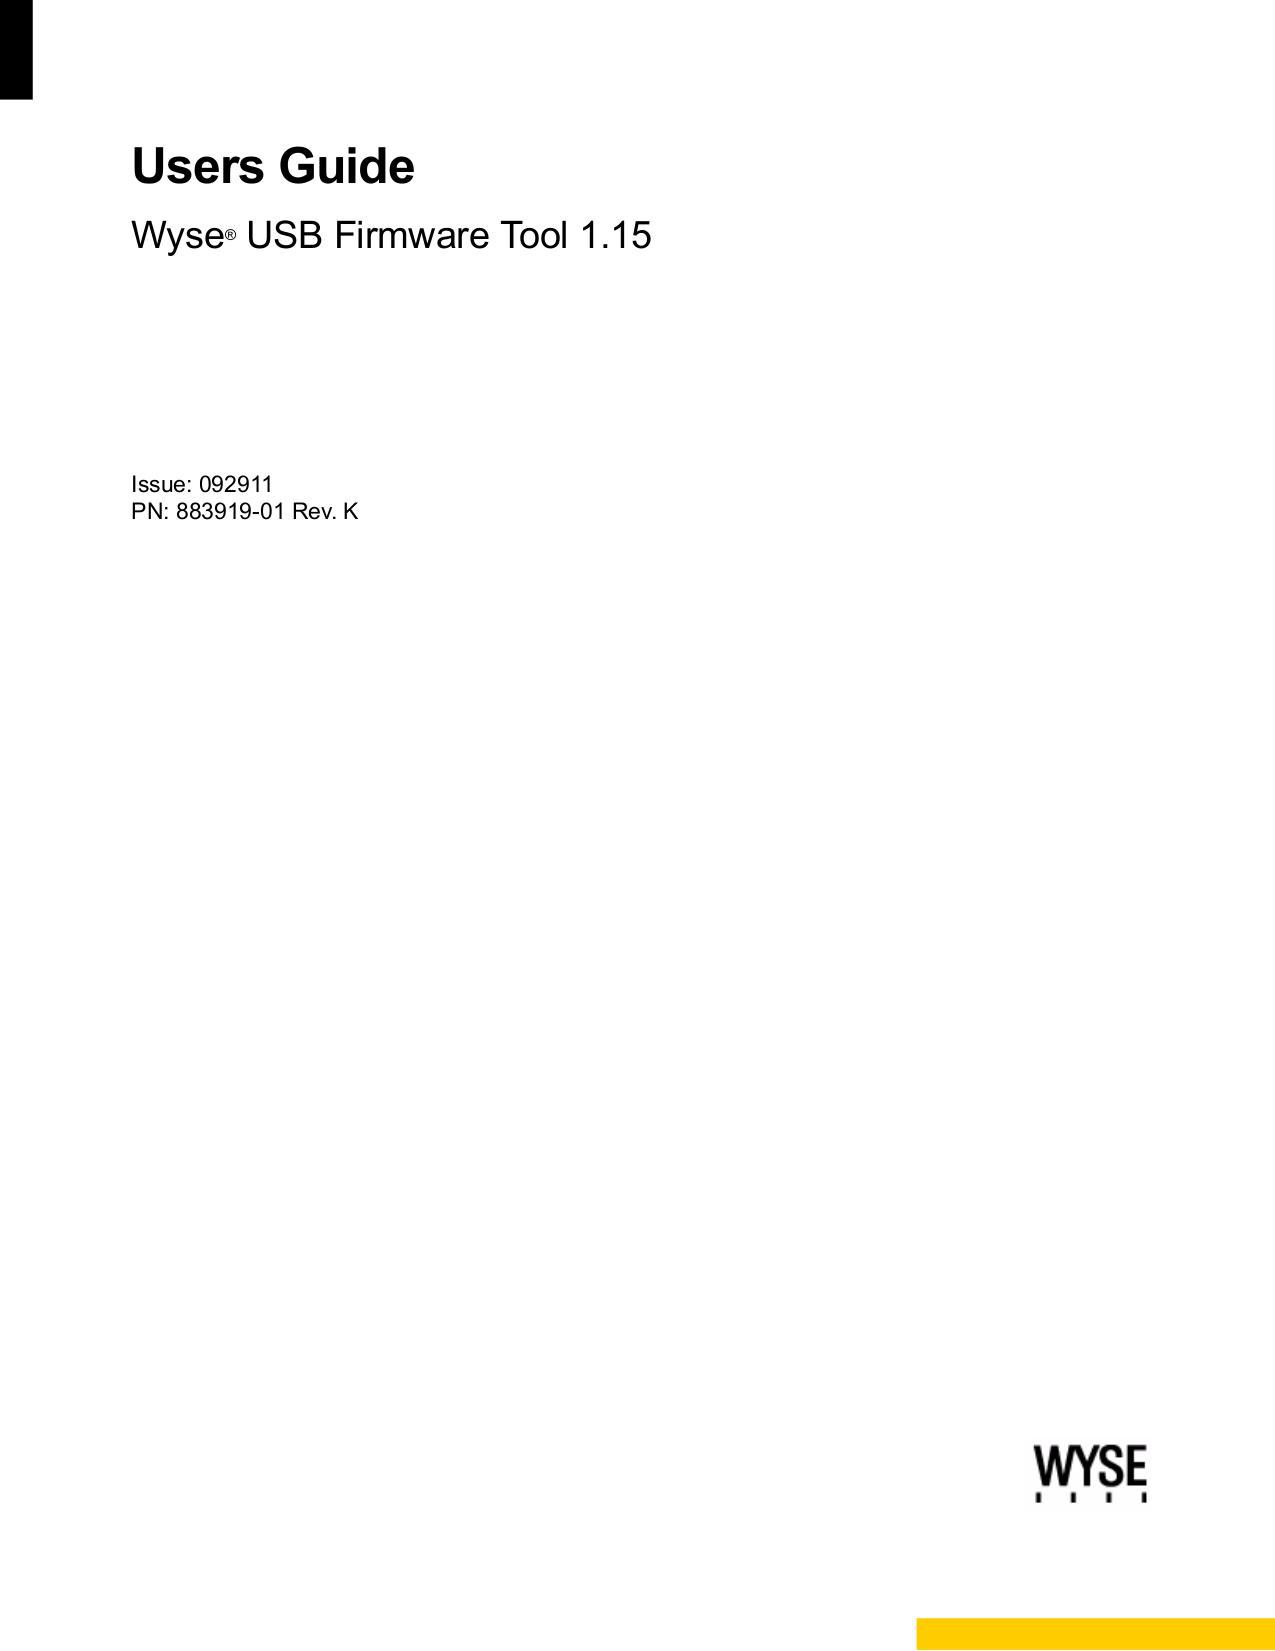 pdf for Wyse Desktop V90 manual